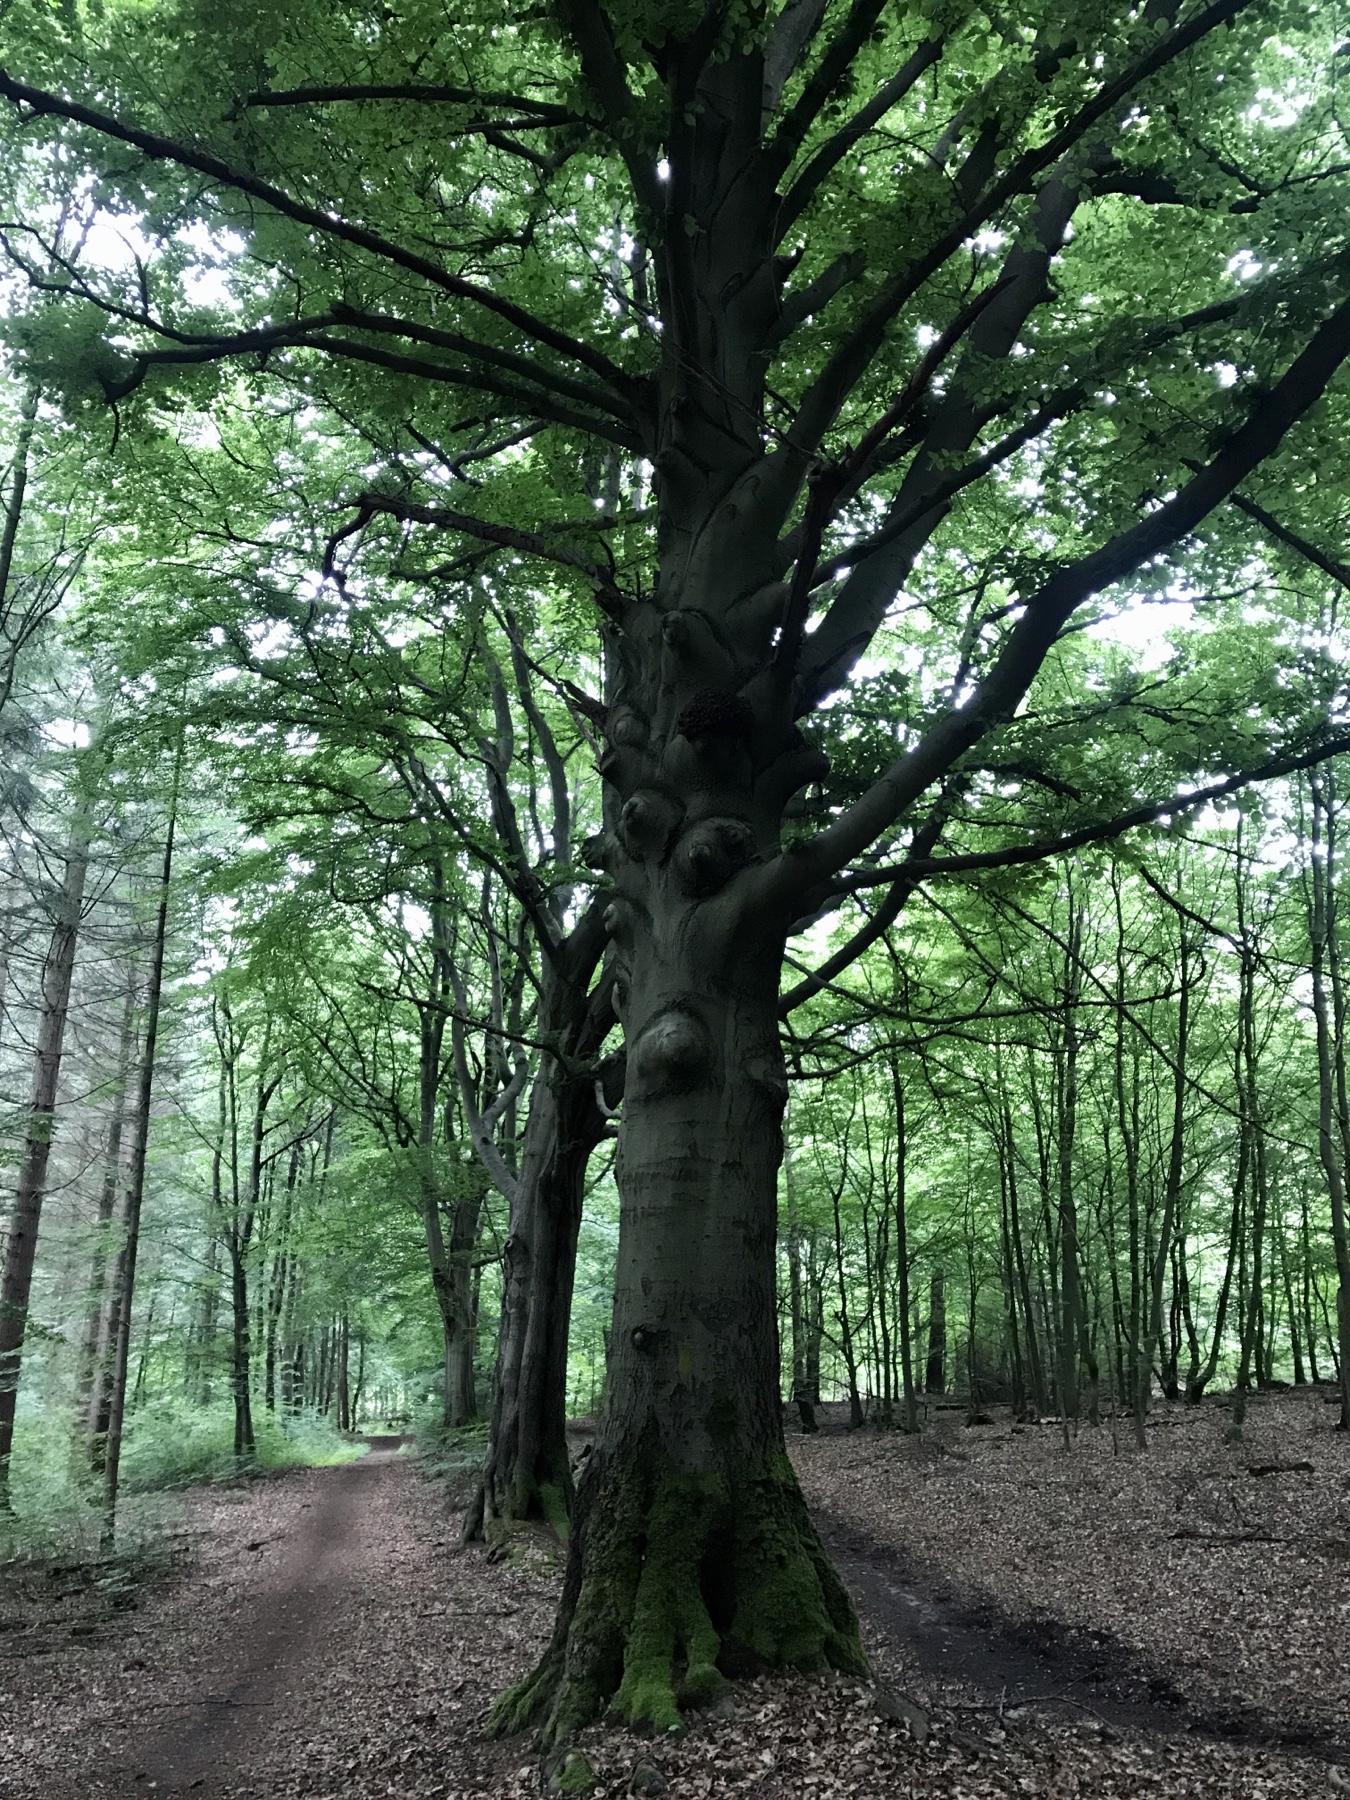 Alter Baum auf dem Weg nach Lütjensee, Stormarnweg, Etappe 2 Großensee Ahrensburg